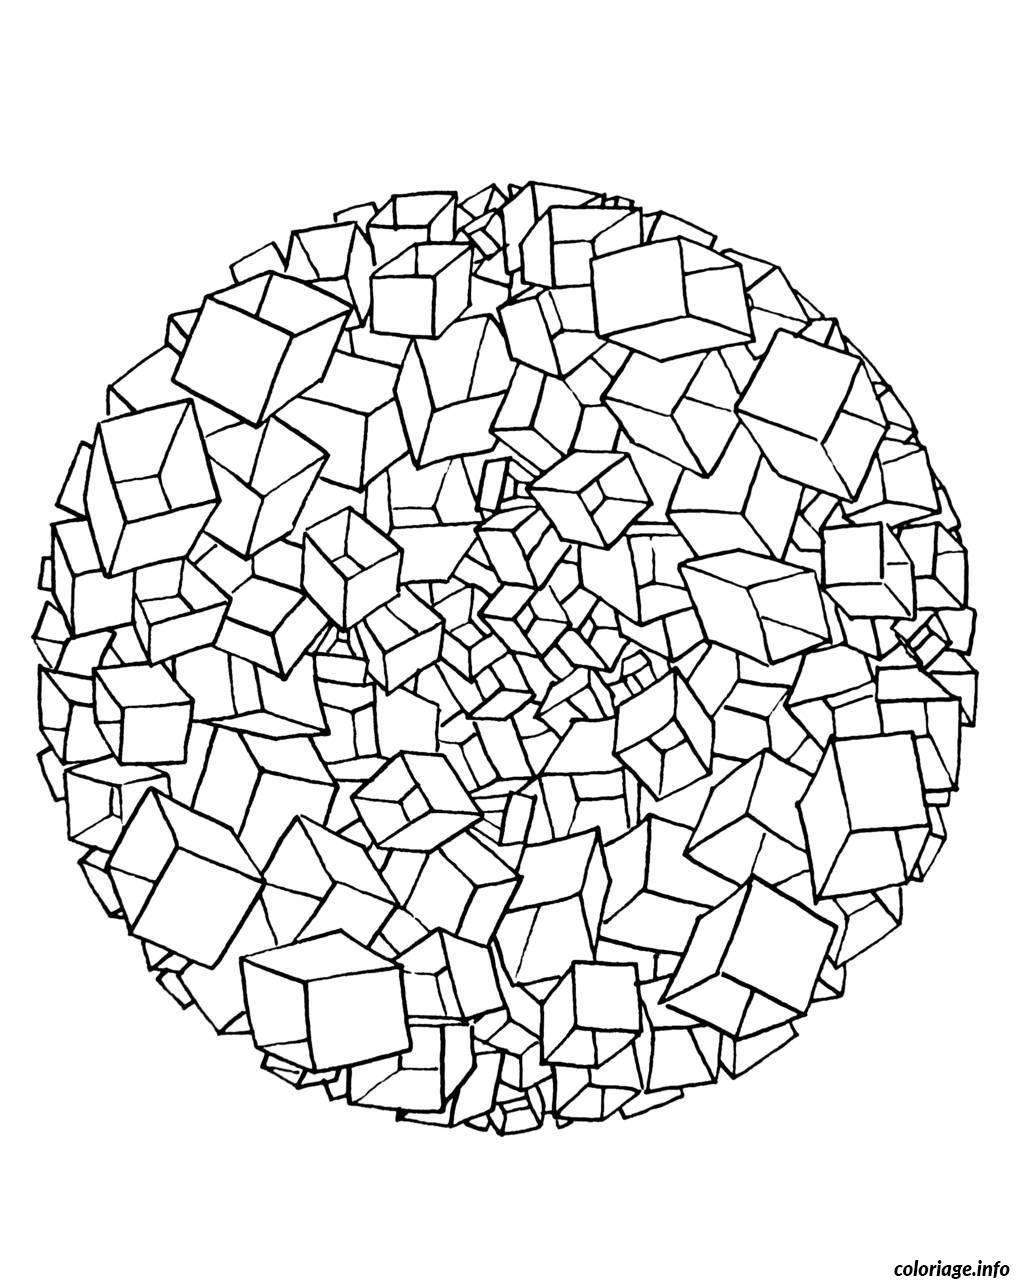 Coloriage Free Mandala To Color Cubes 3d Dessin